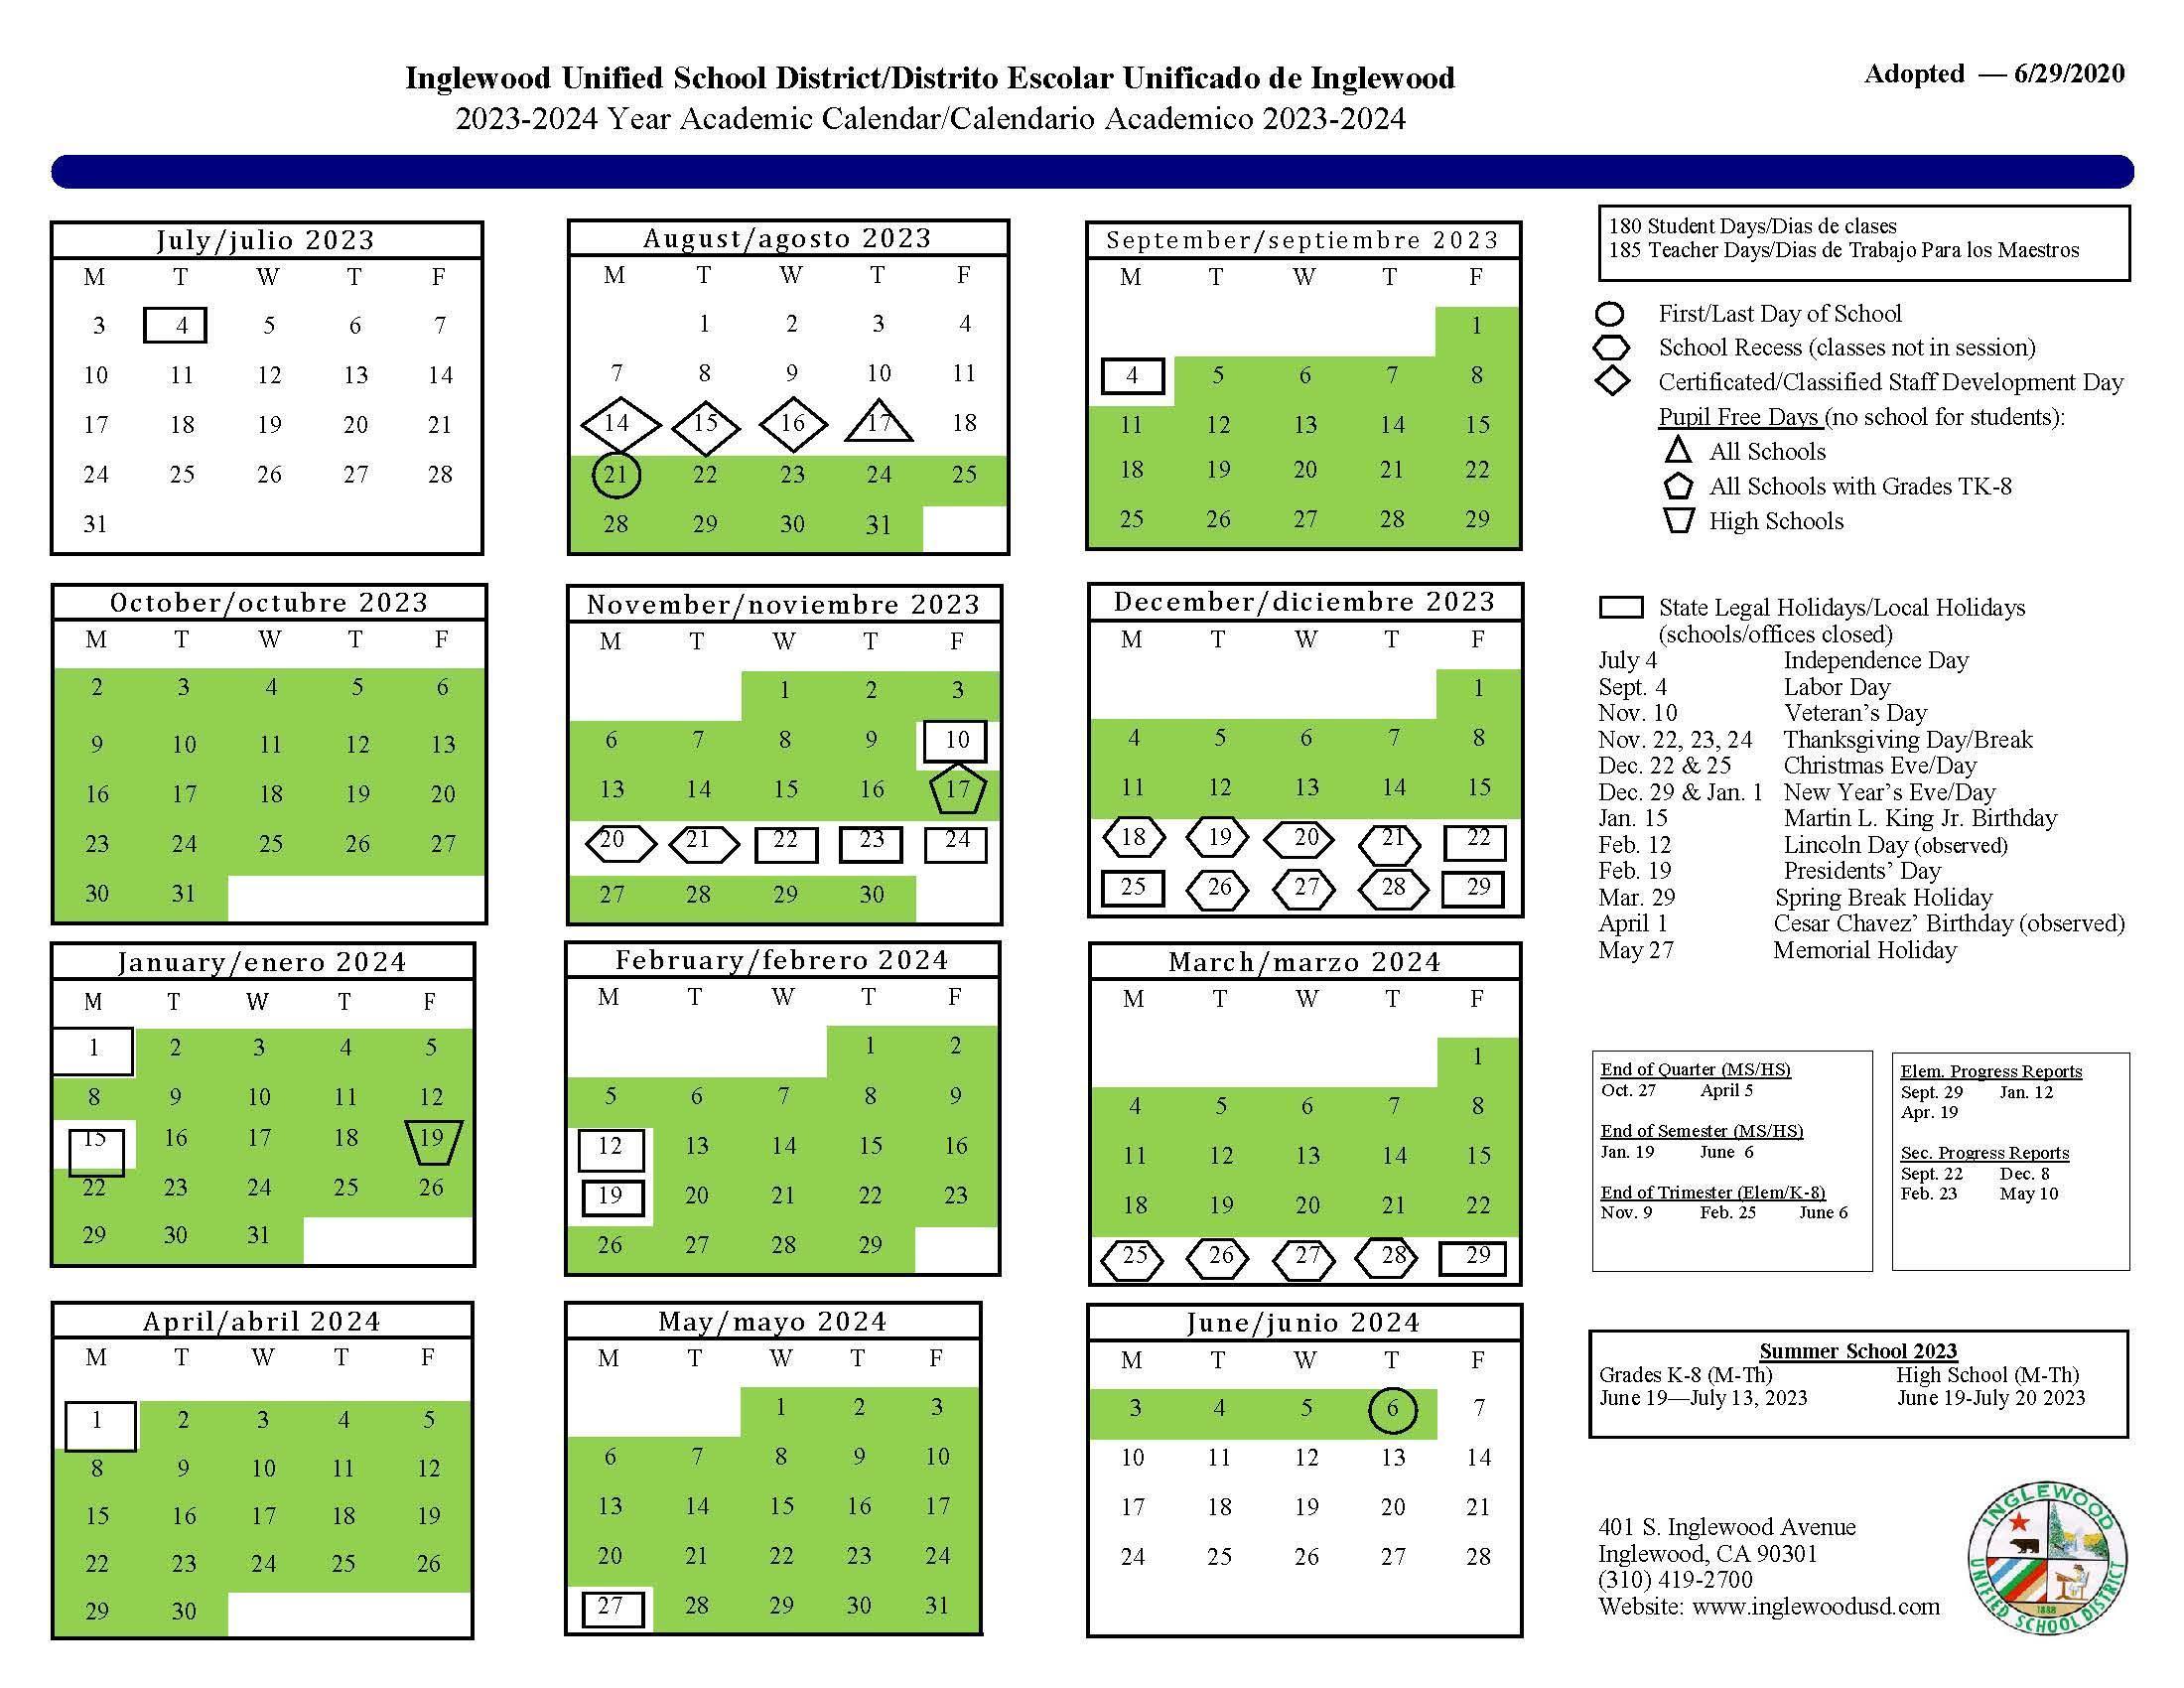 Iusd Calendar 2022.Calendar About Us Inglewood Unified School District